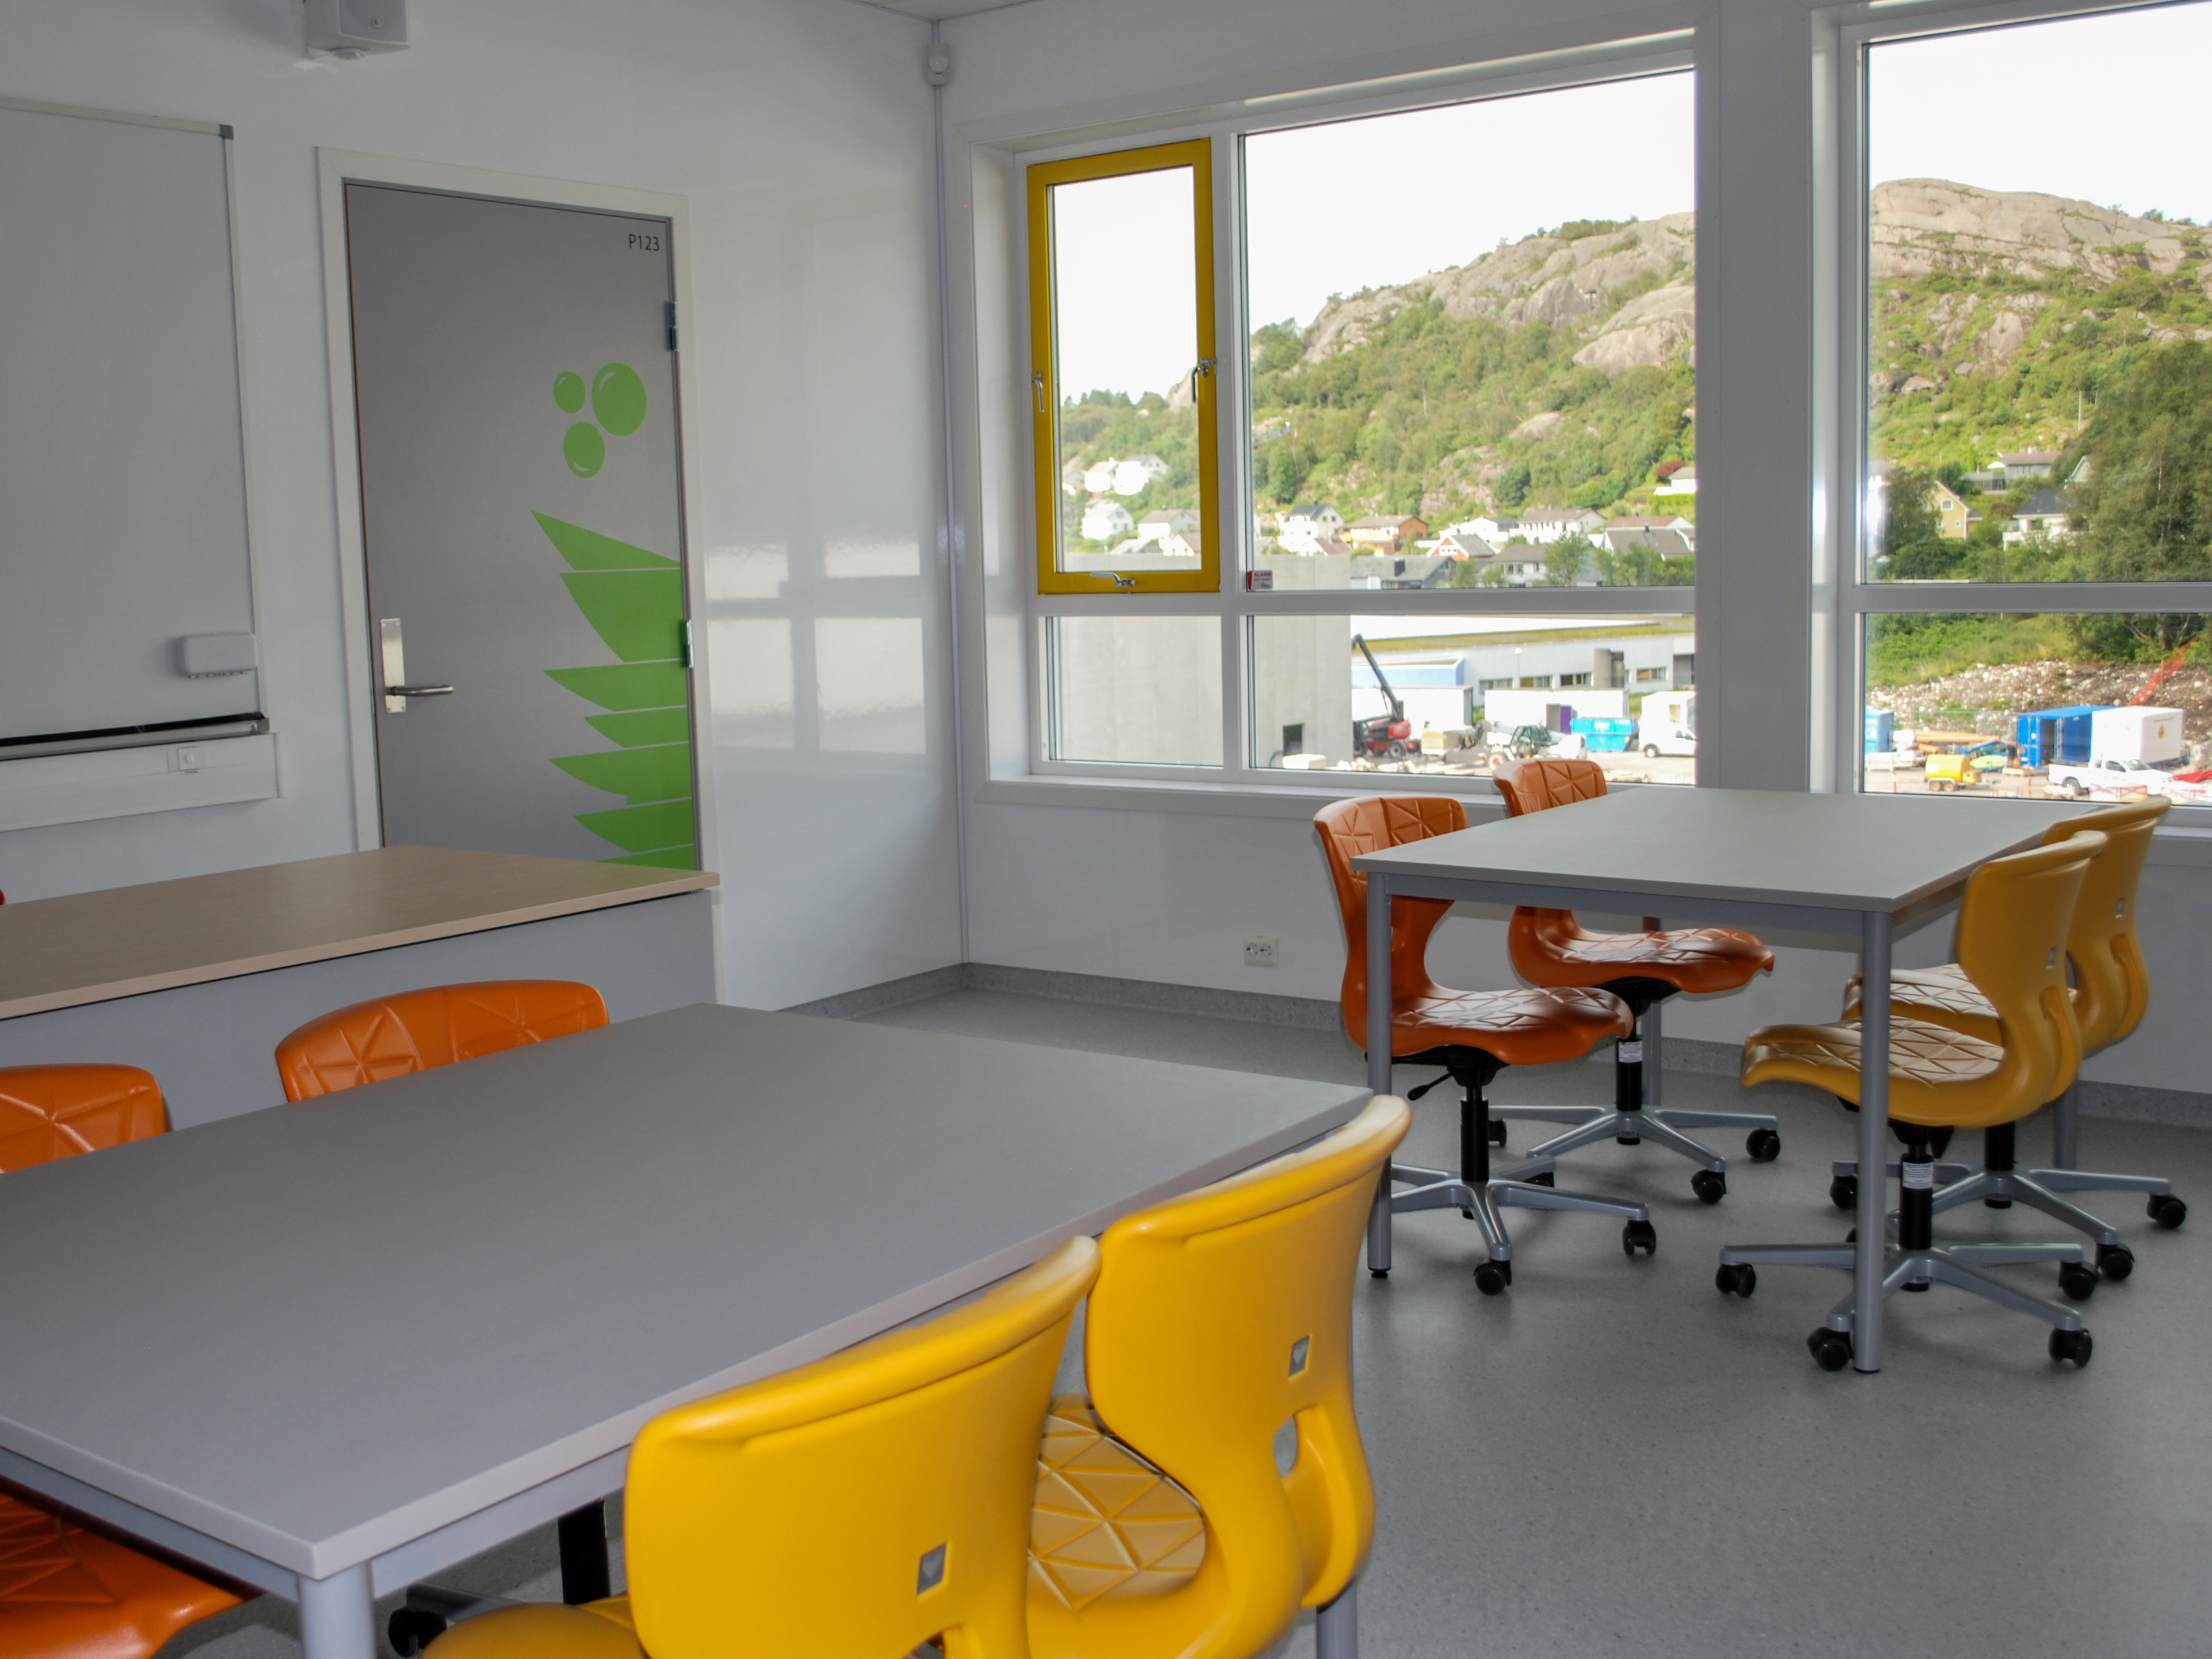 P-bygget-lagård-ungdomsskole-DSC_0075.JPG